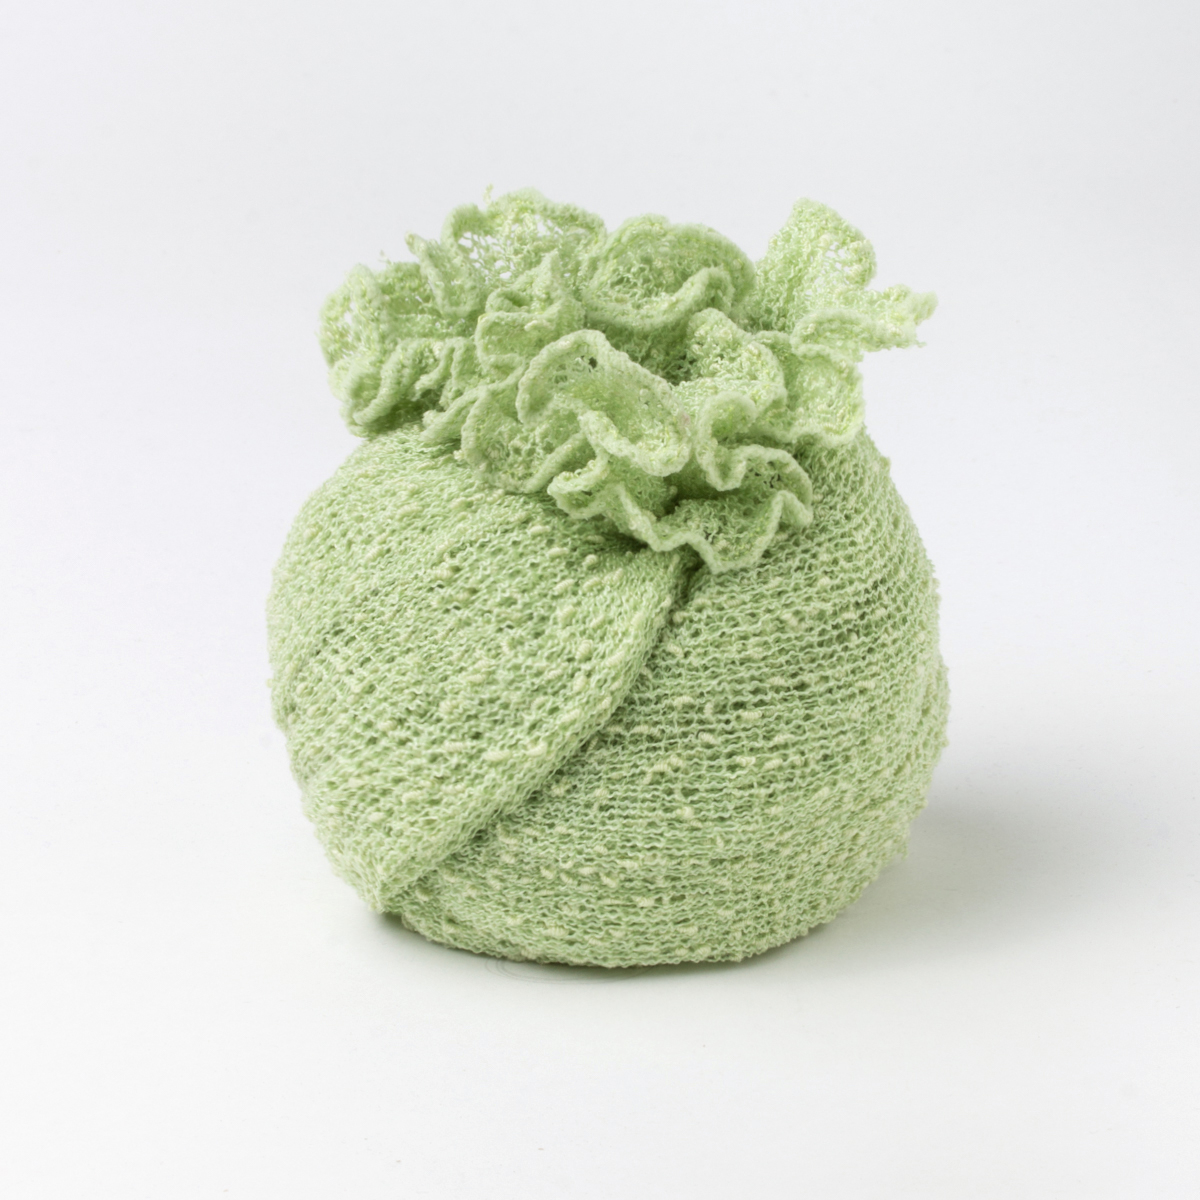 Ponchetto Verde Mela   abbigliamento etnico donna